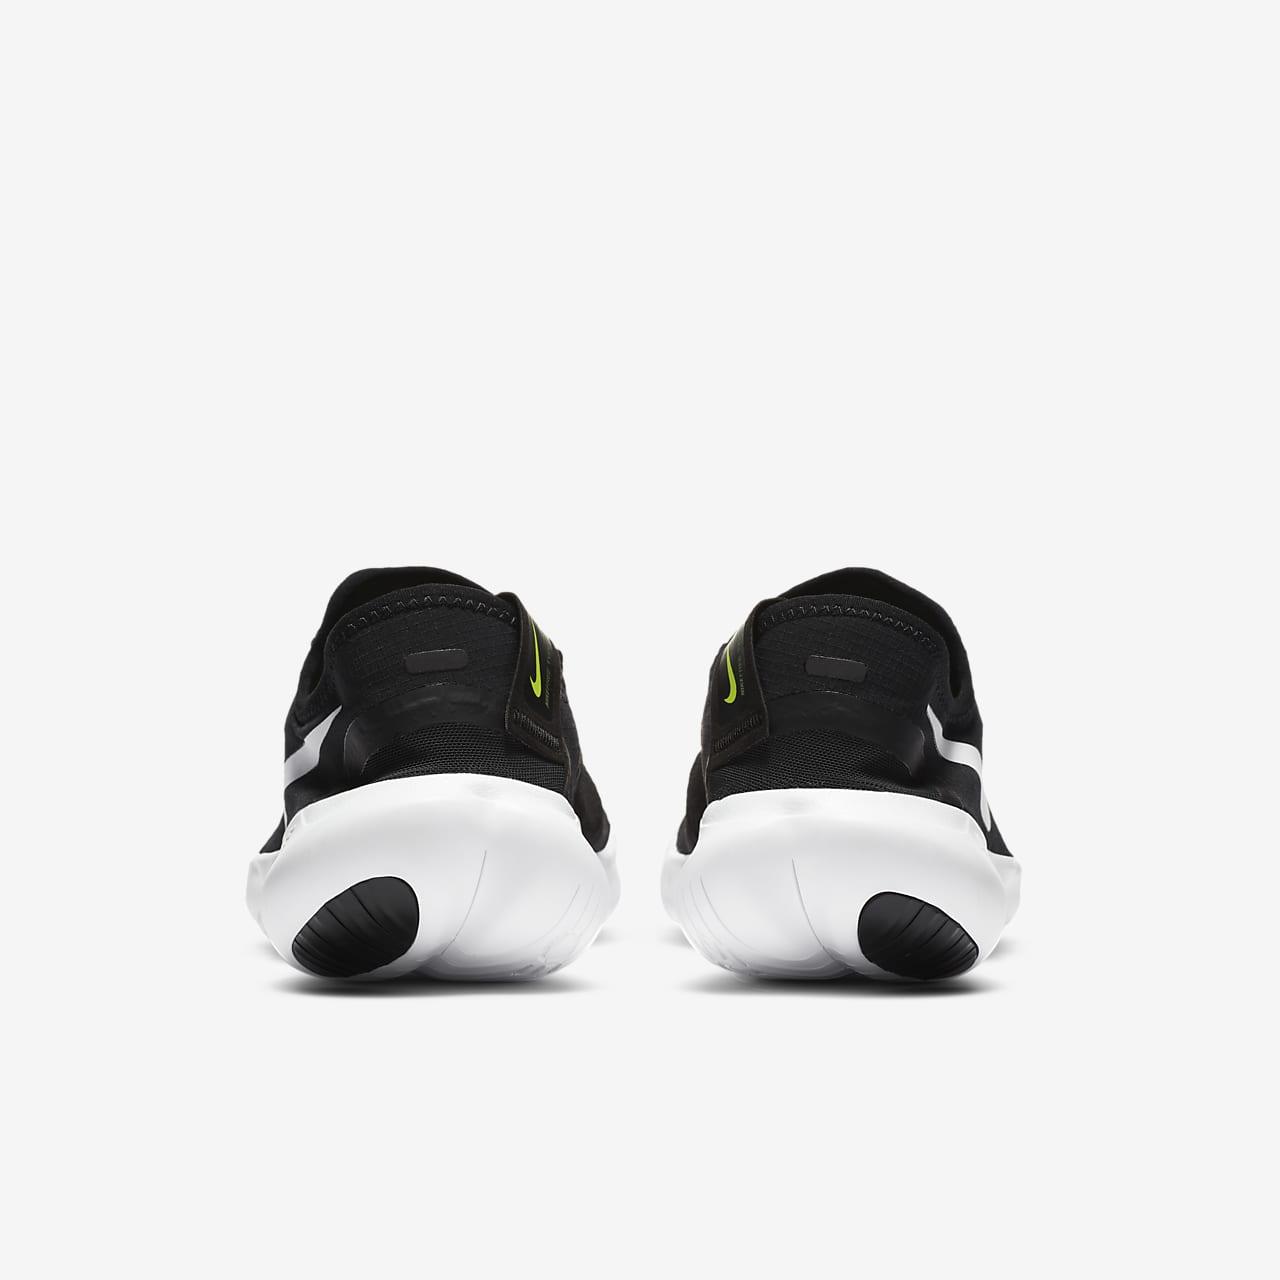 Nike · Free RN 5.0 férfi futócipő Férfiak